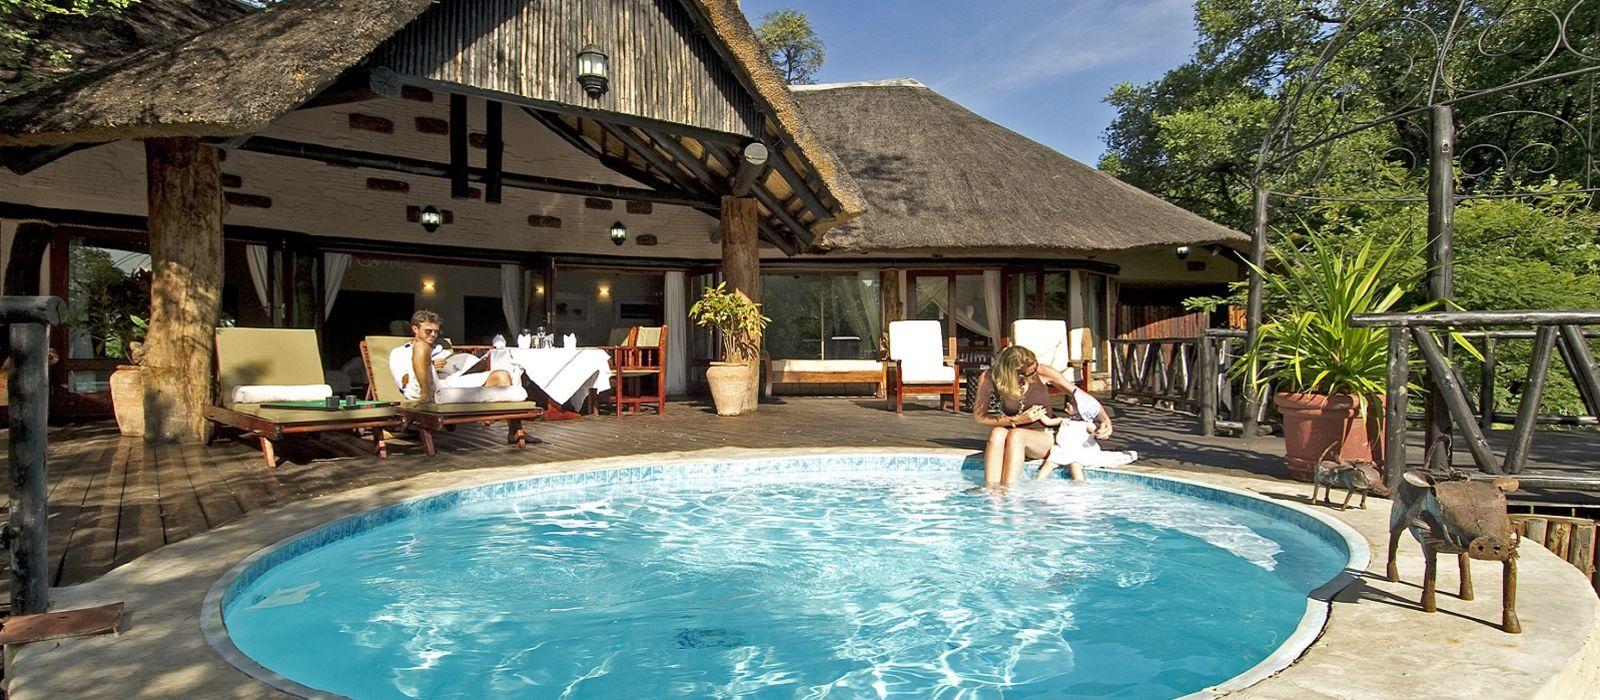 Hotel Sussi & Chuma Zambia